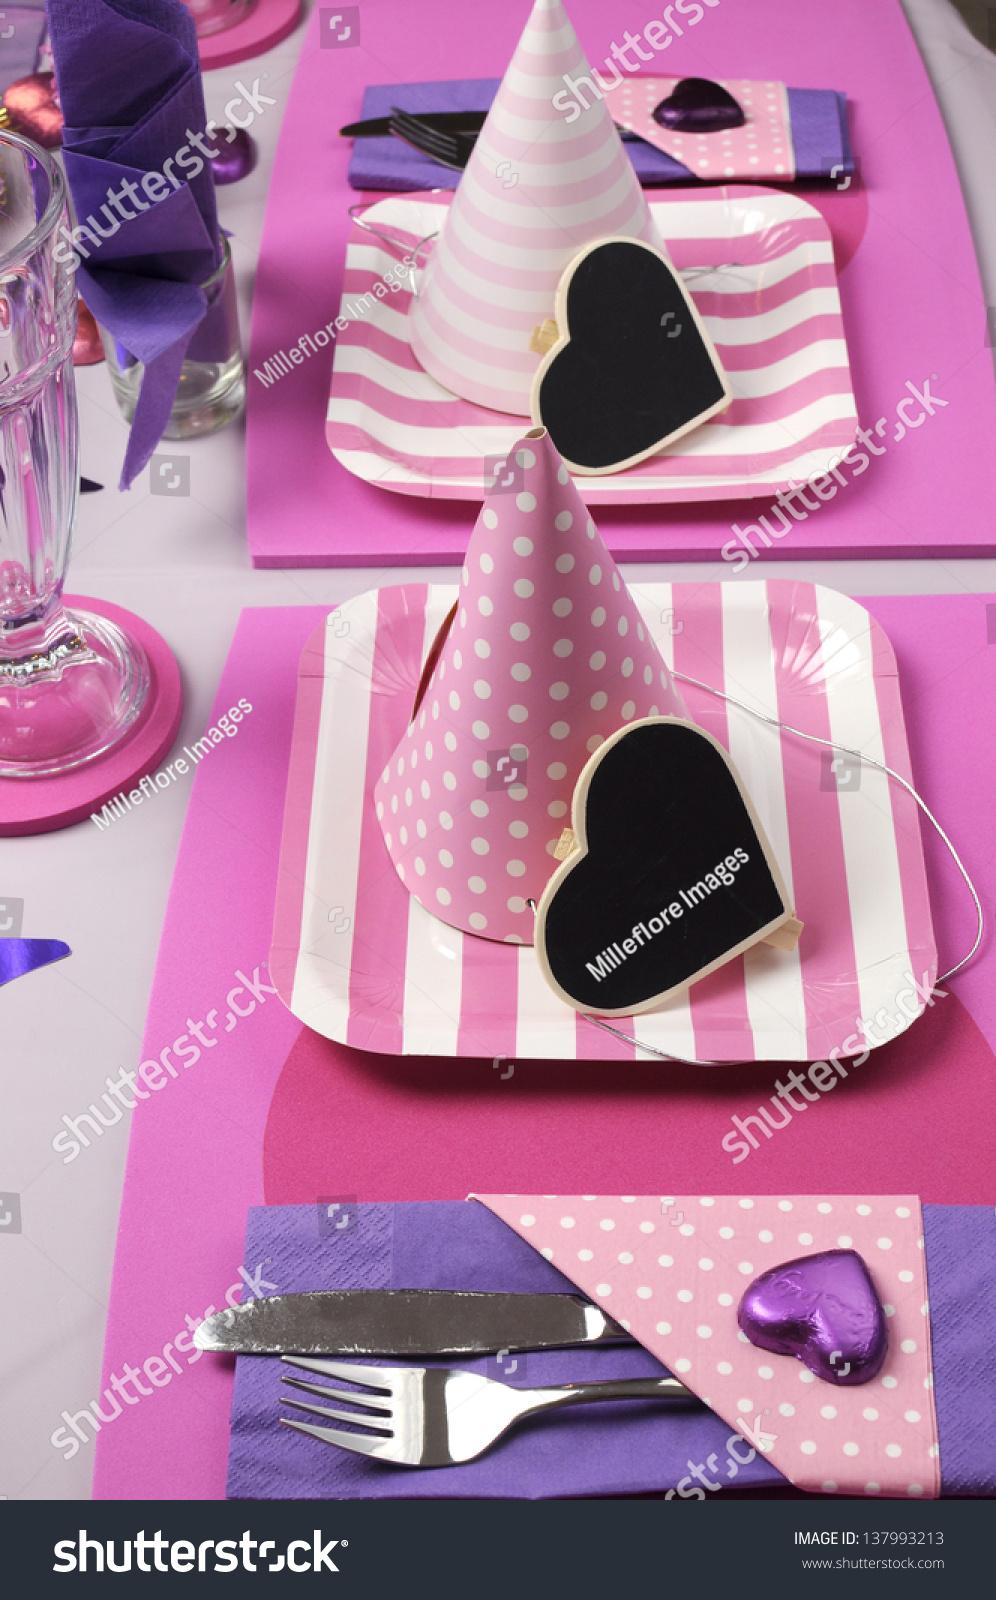 13 best Purple Table Settings images on Pinterest | Purple ... |Pink And Purple Table Setting